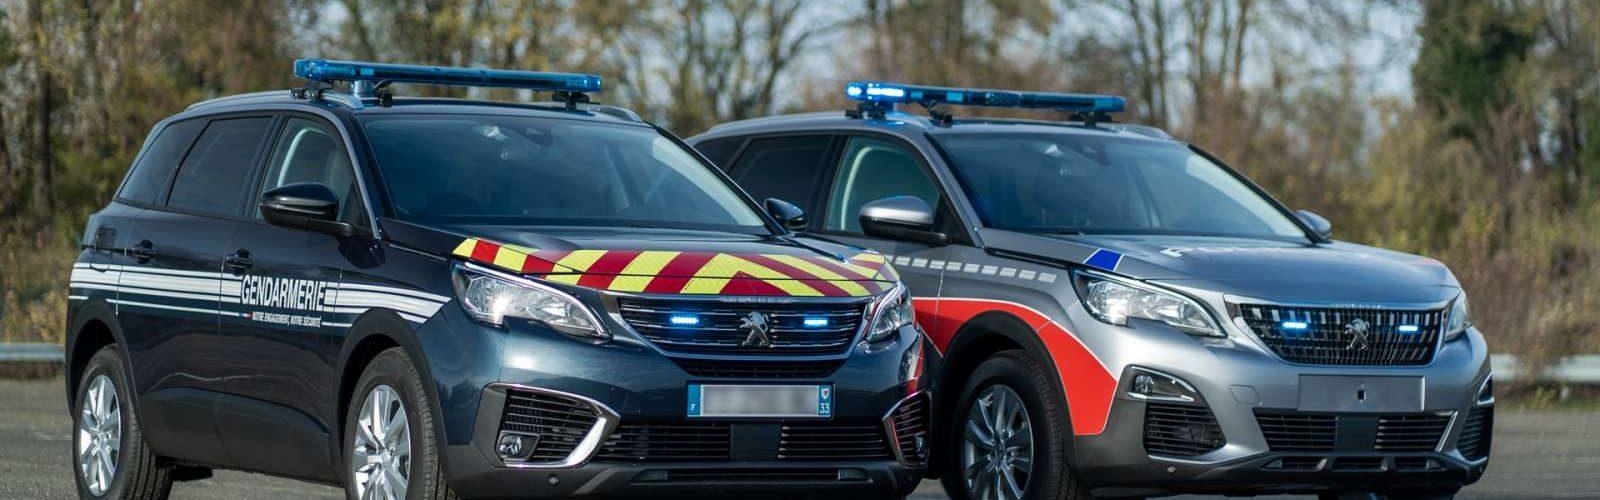 Peugeot 5008 police gendarmerie 16